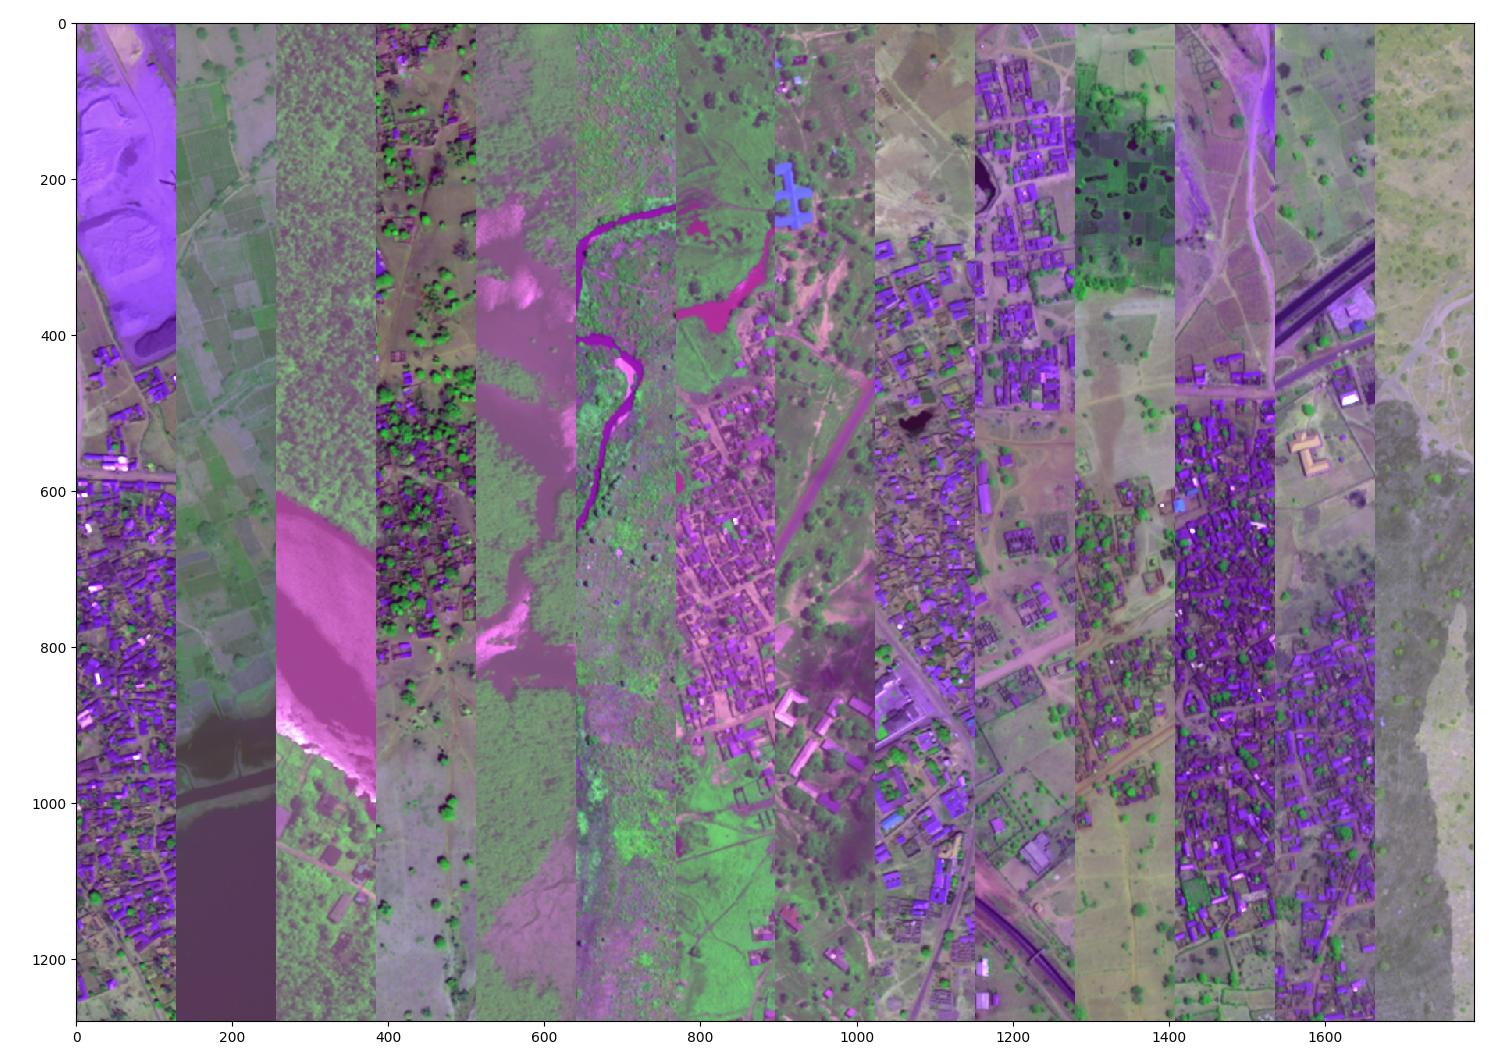 Второе почетное. Заметки участника конкурса Dstl Satellite Imagery Feature Detection - 9